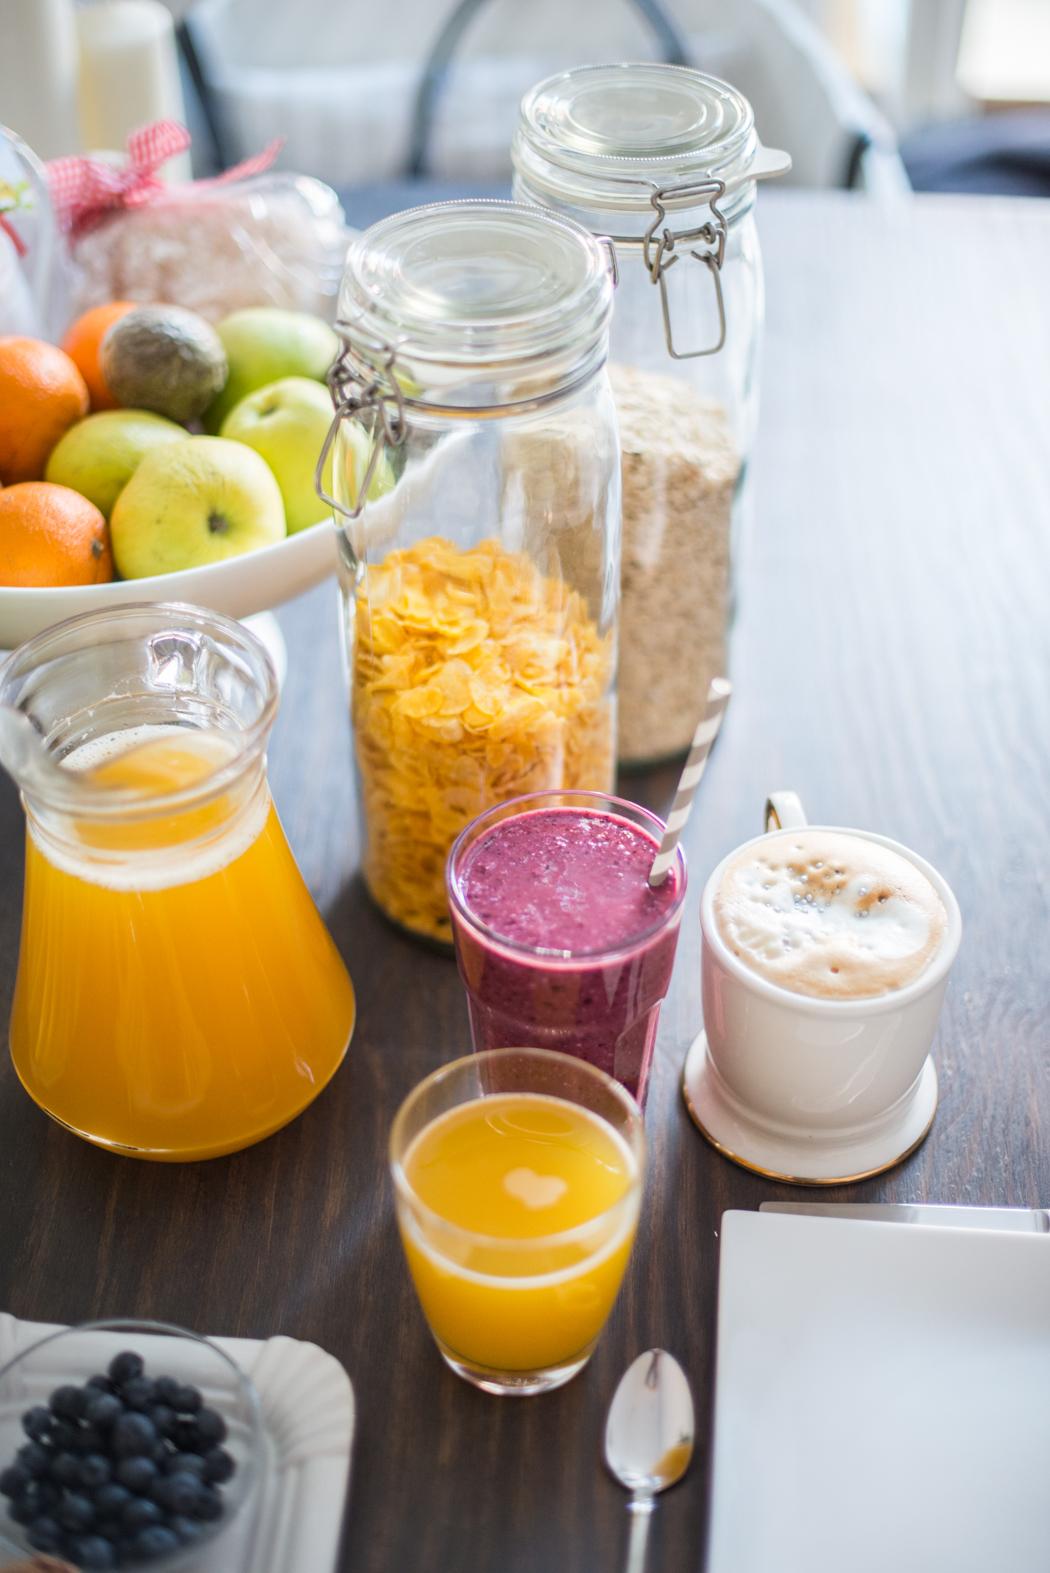 Foodblogger-München-Foodblog-Deutschland-Lindarella-veganes-Frühstück-Frühstücksinspiration-vegane-Pancakes-Clean-Eating-4